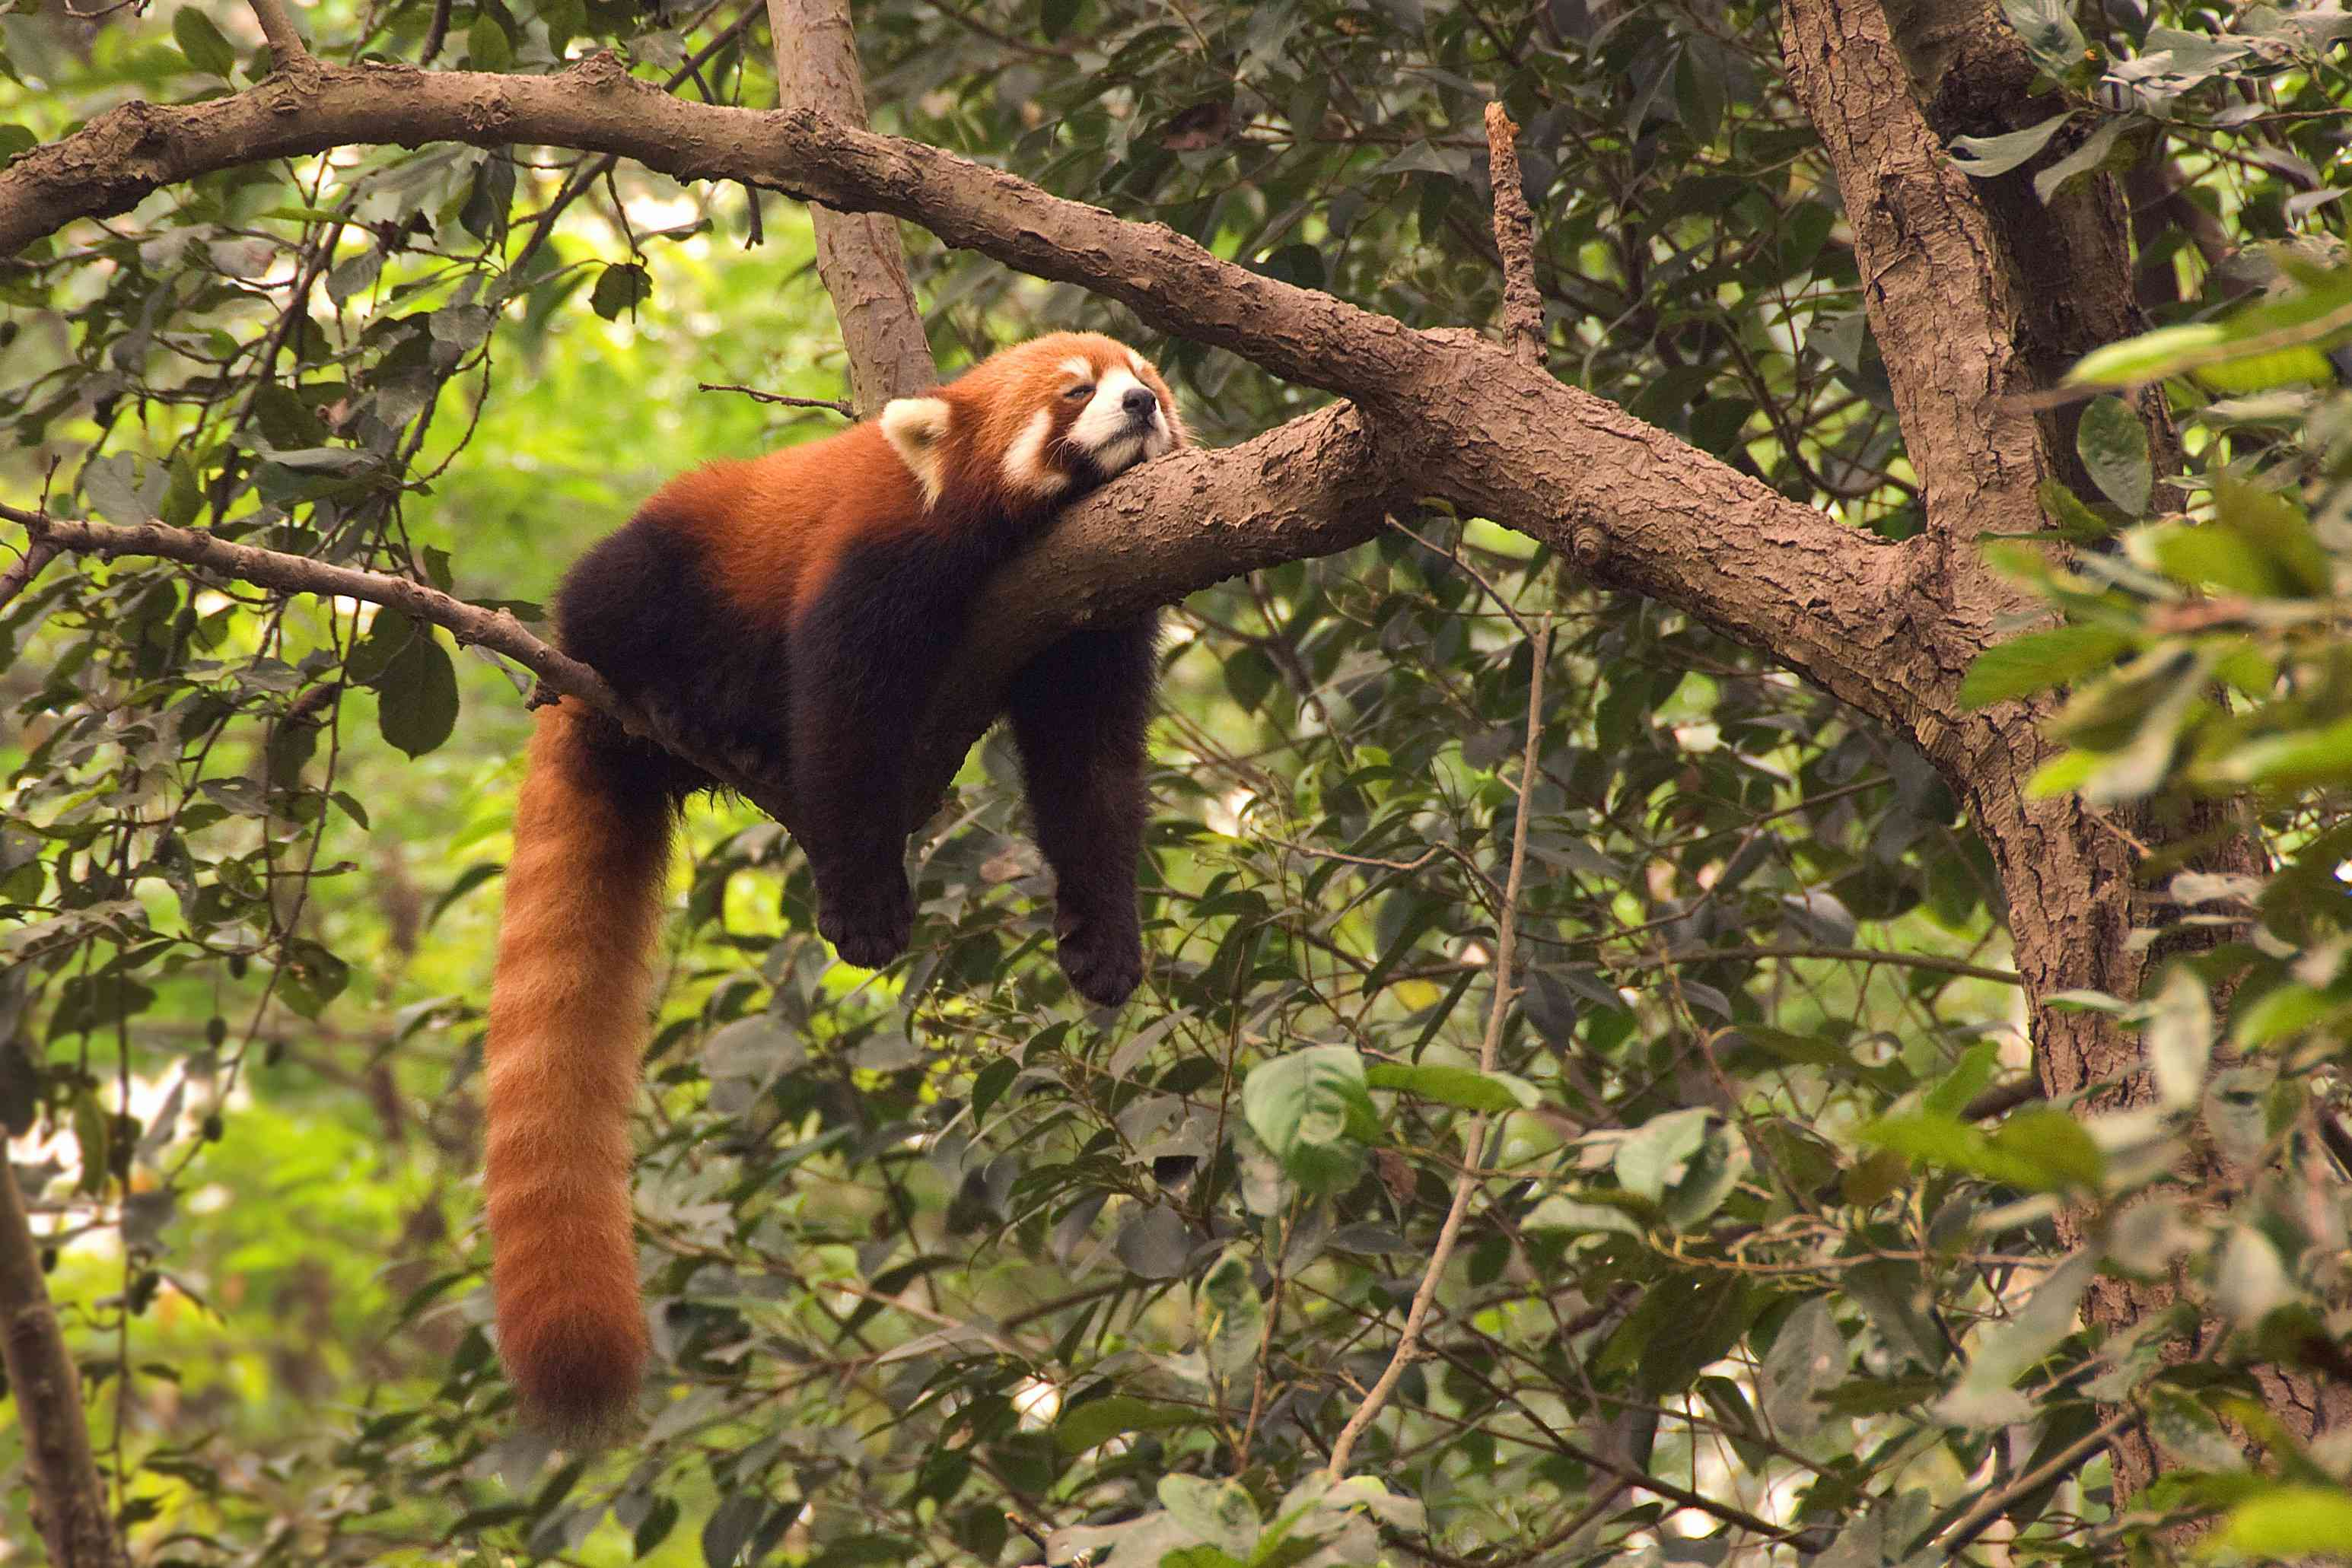 Red panda sleeping on a tree branch